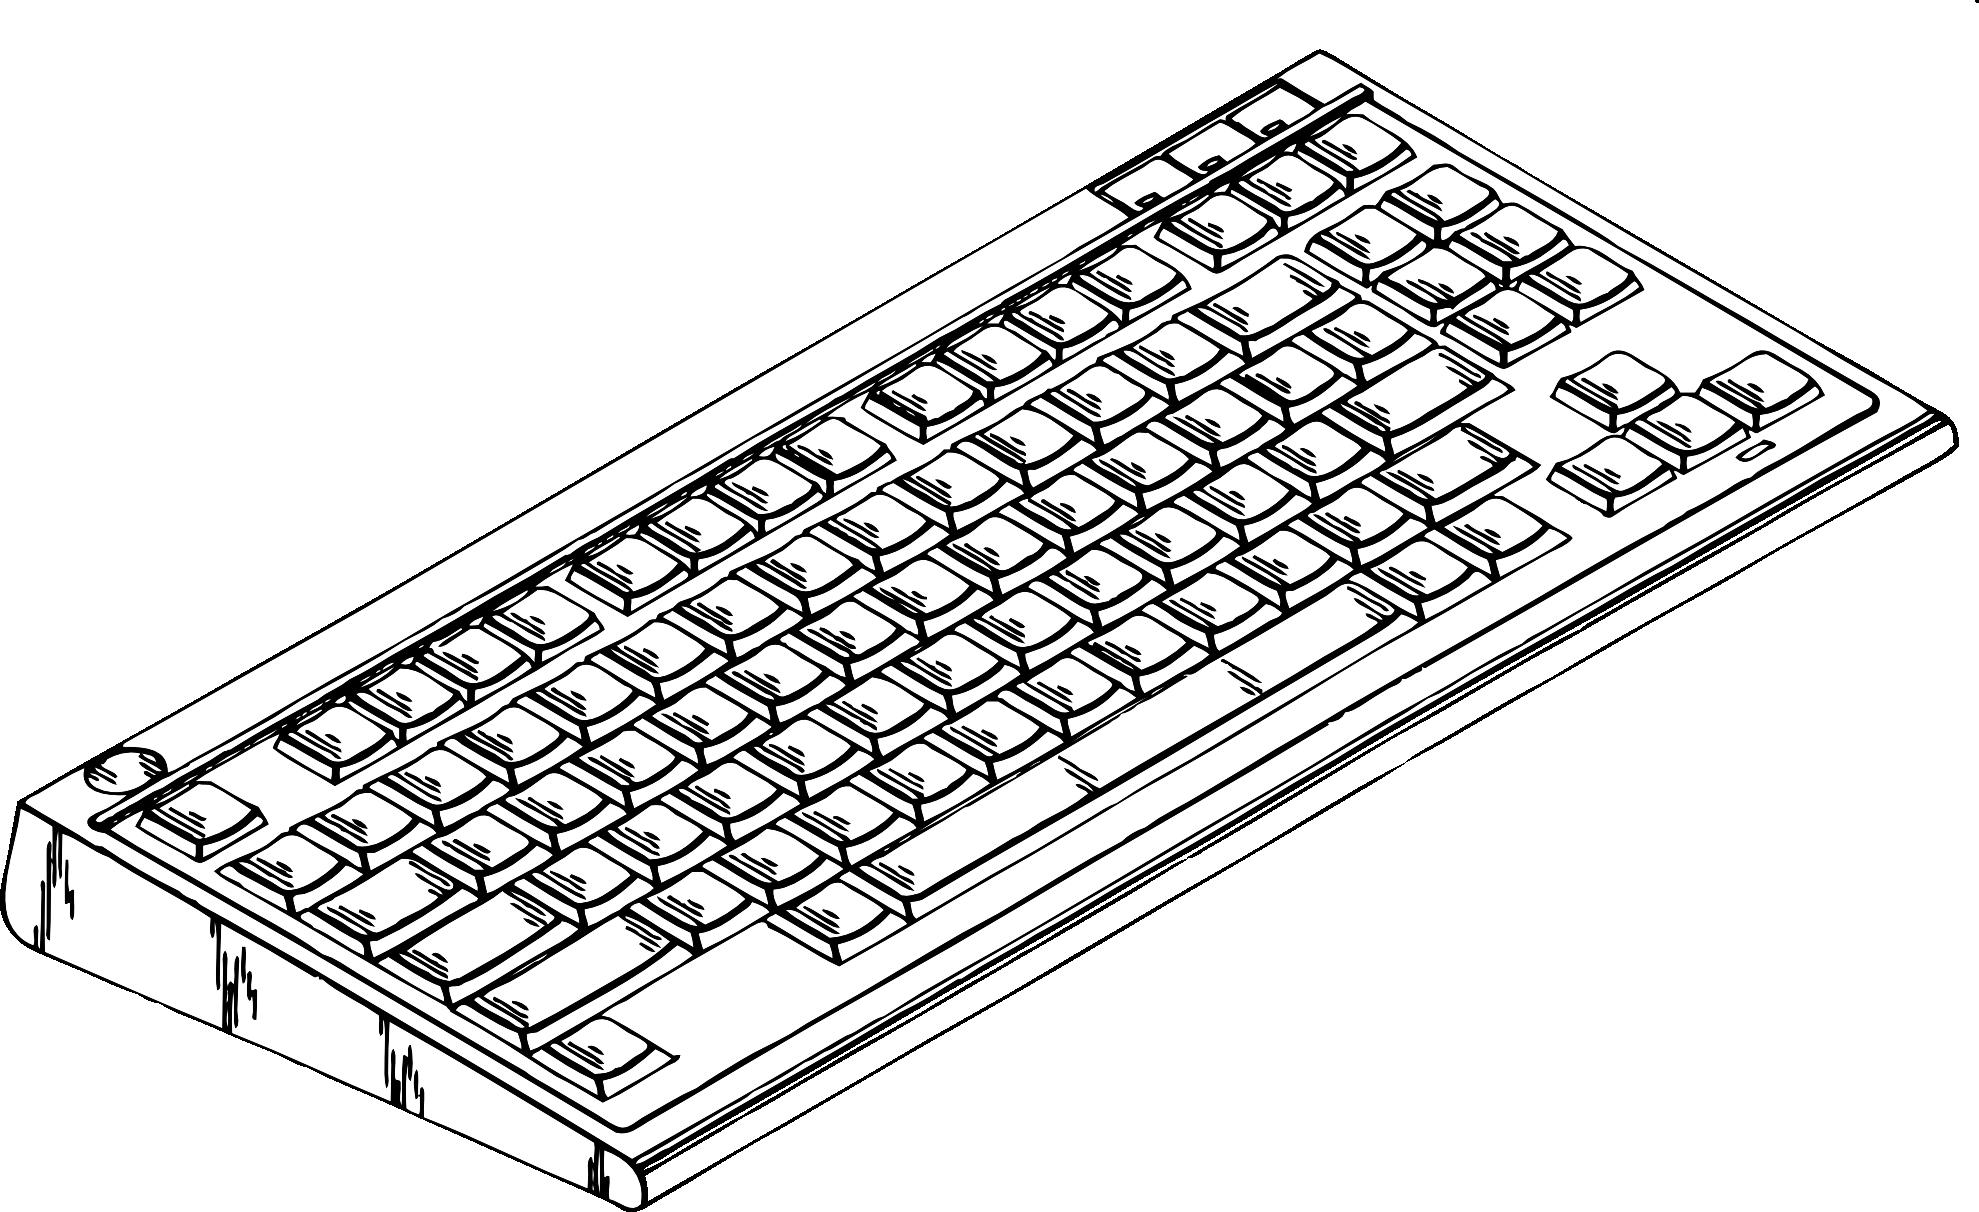 Computer keyboard clipart for kids transparent.